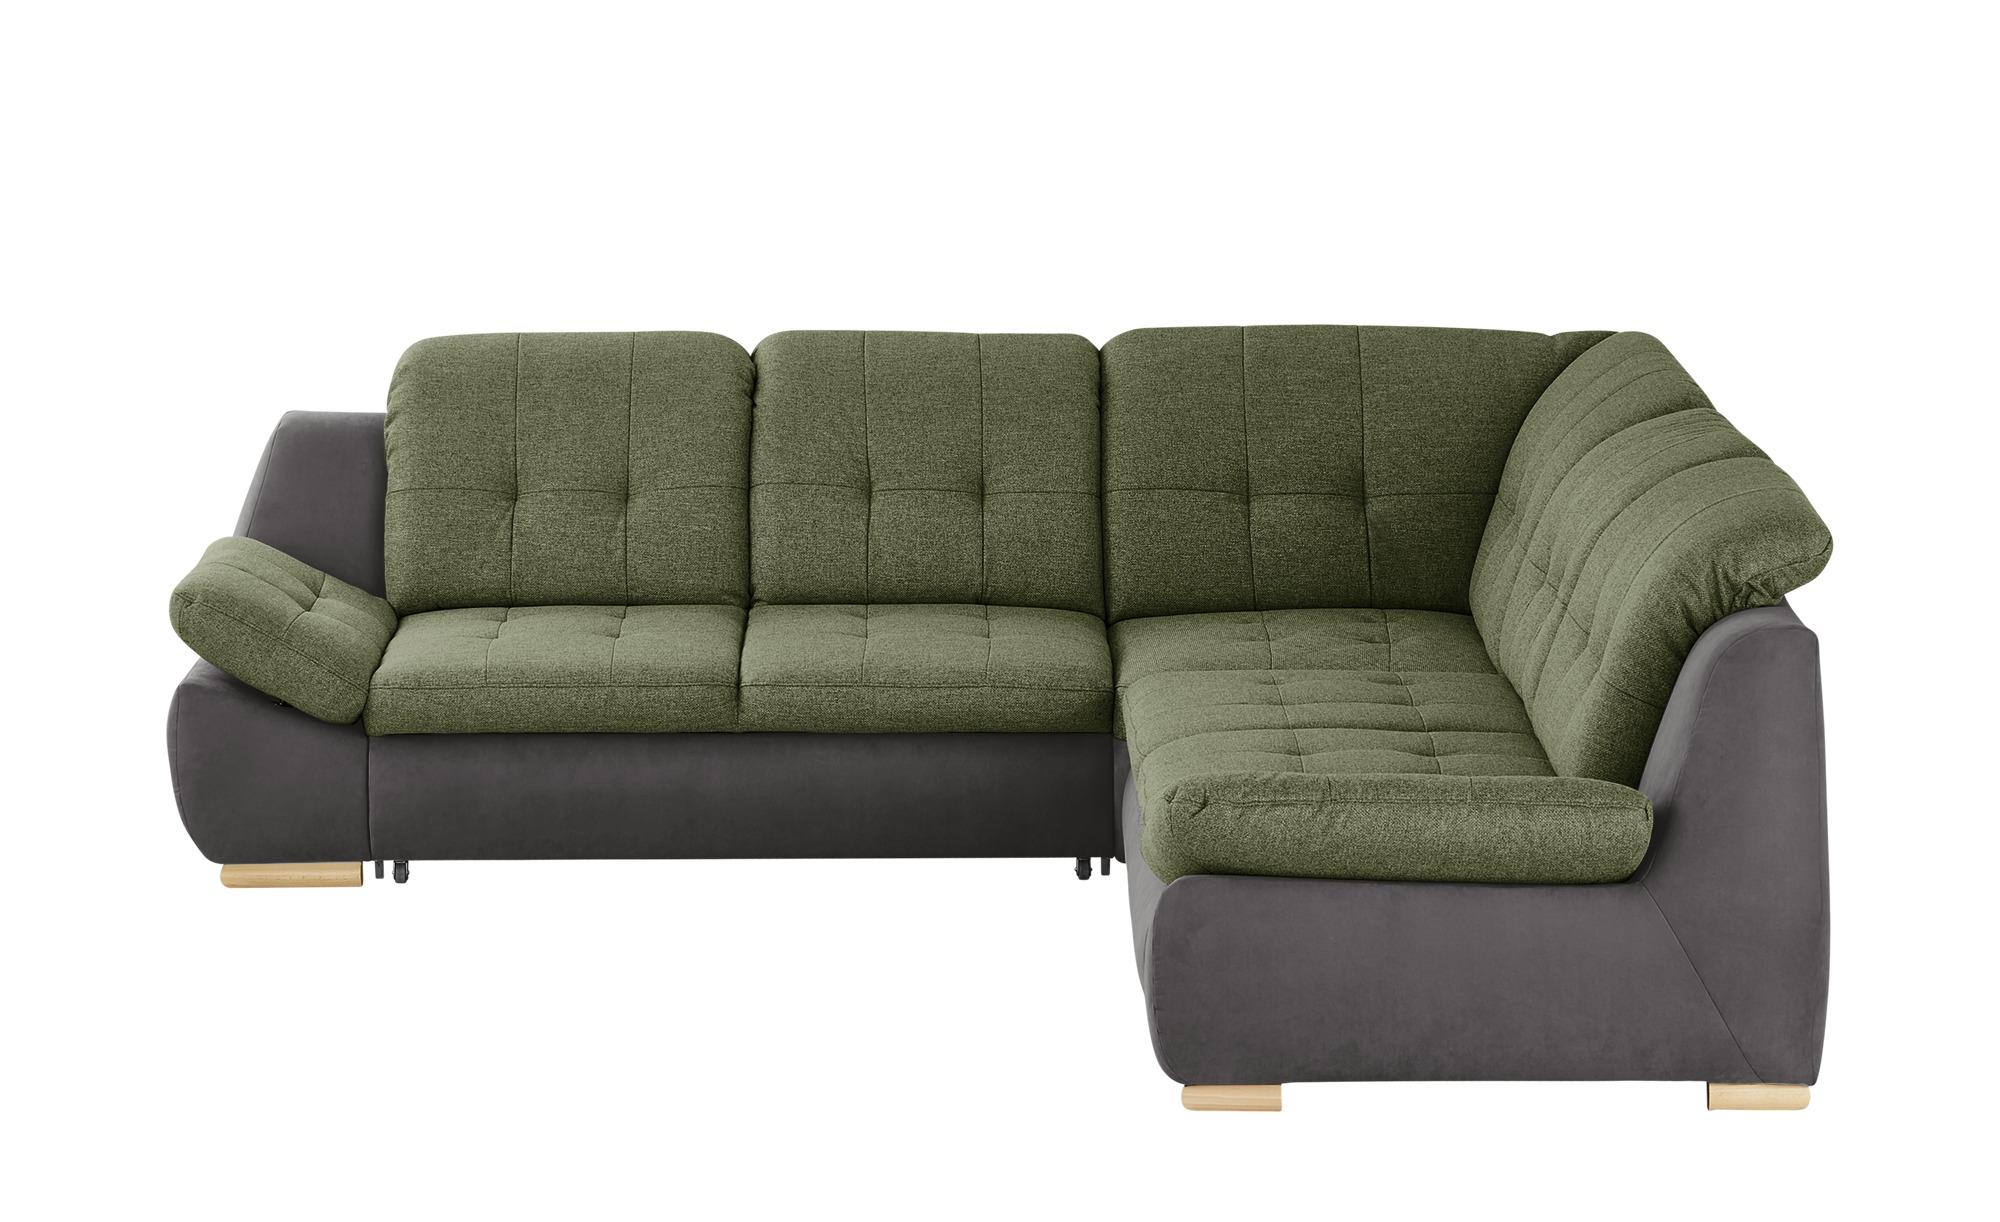 Ecksofa Lilli Grun Masse Cm H 82 Polstermobel Sofas Ecksofas Hoffner Sofa Ecksofa Kunstleder Couch